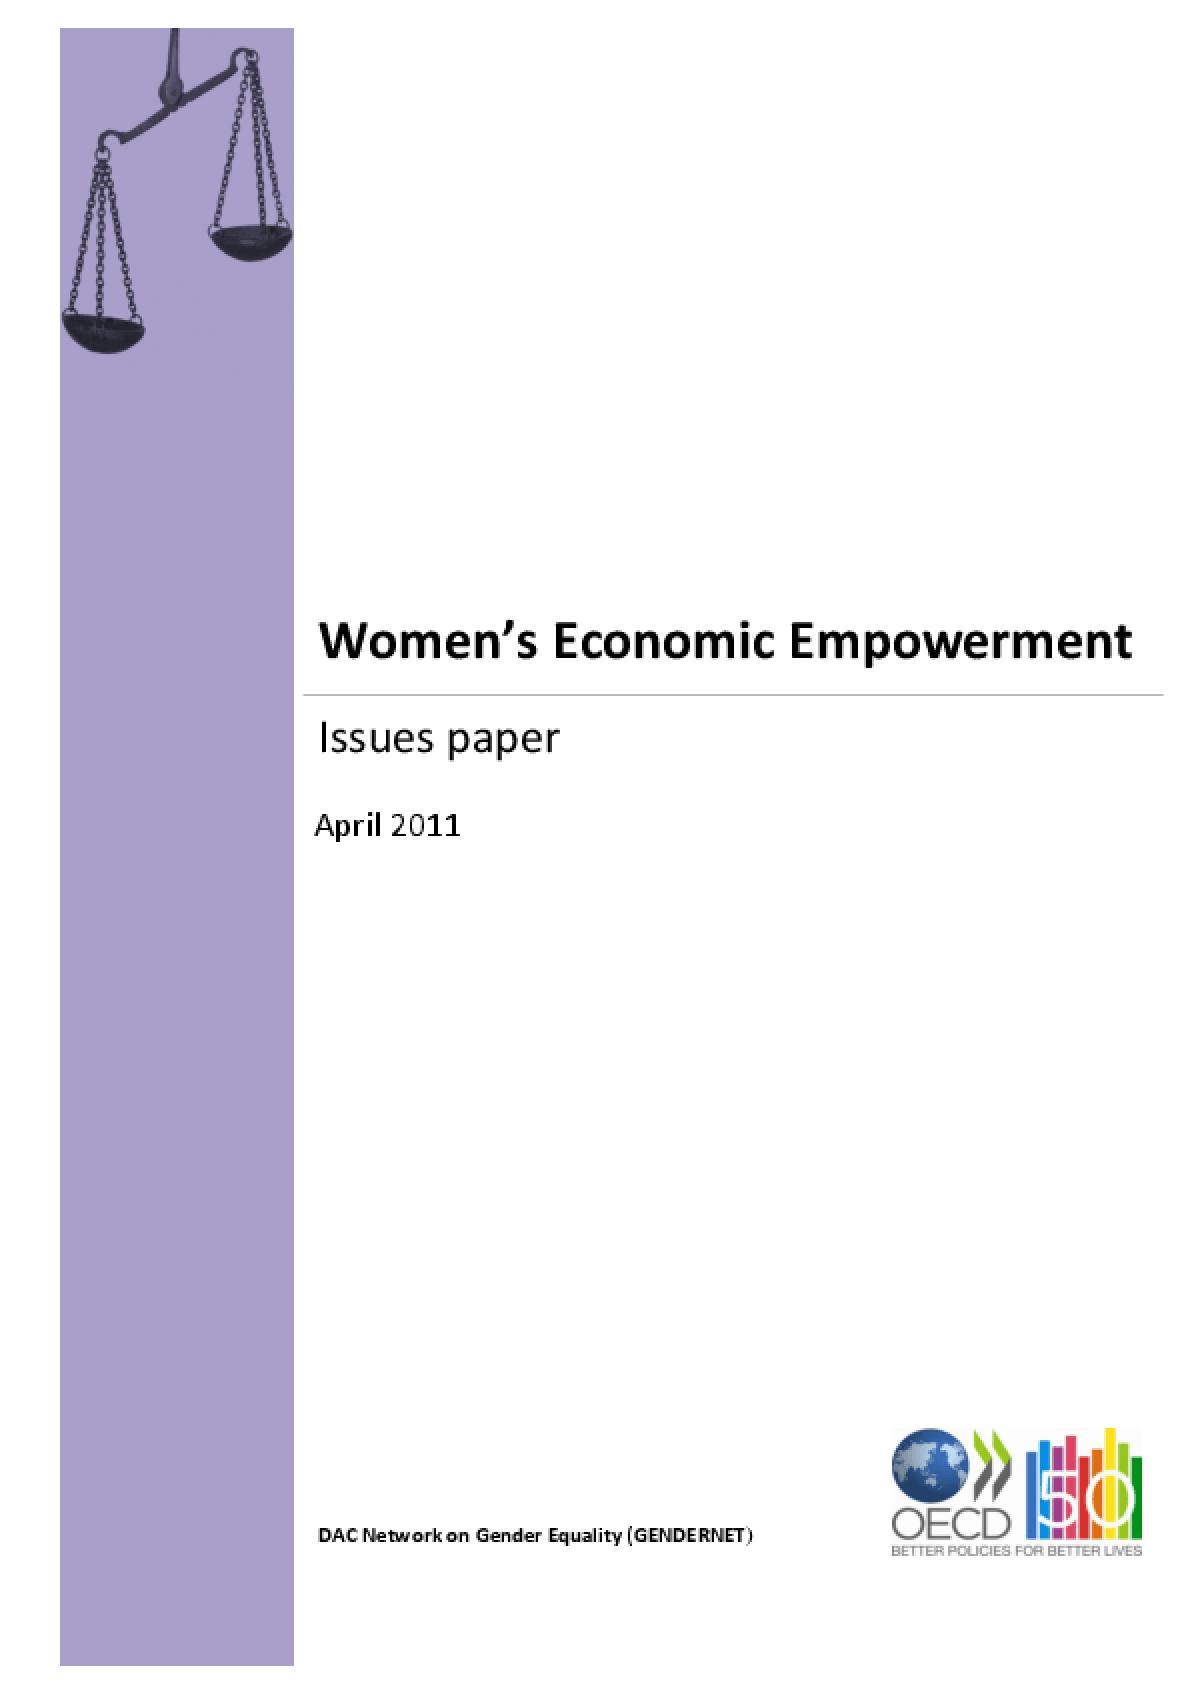 Women's Economic Empowerment: Issues Paper